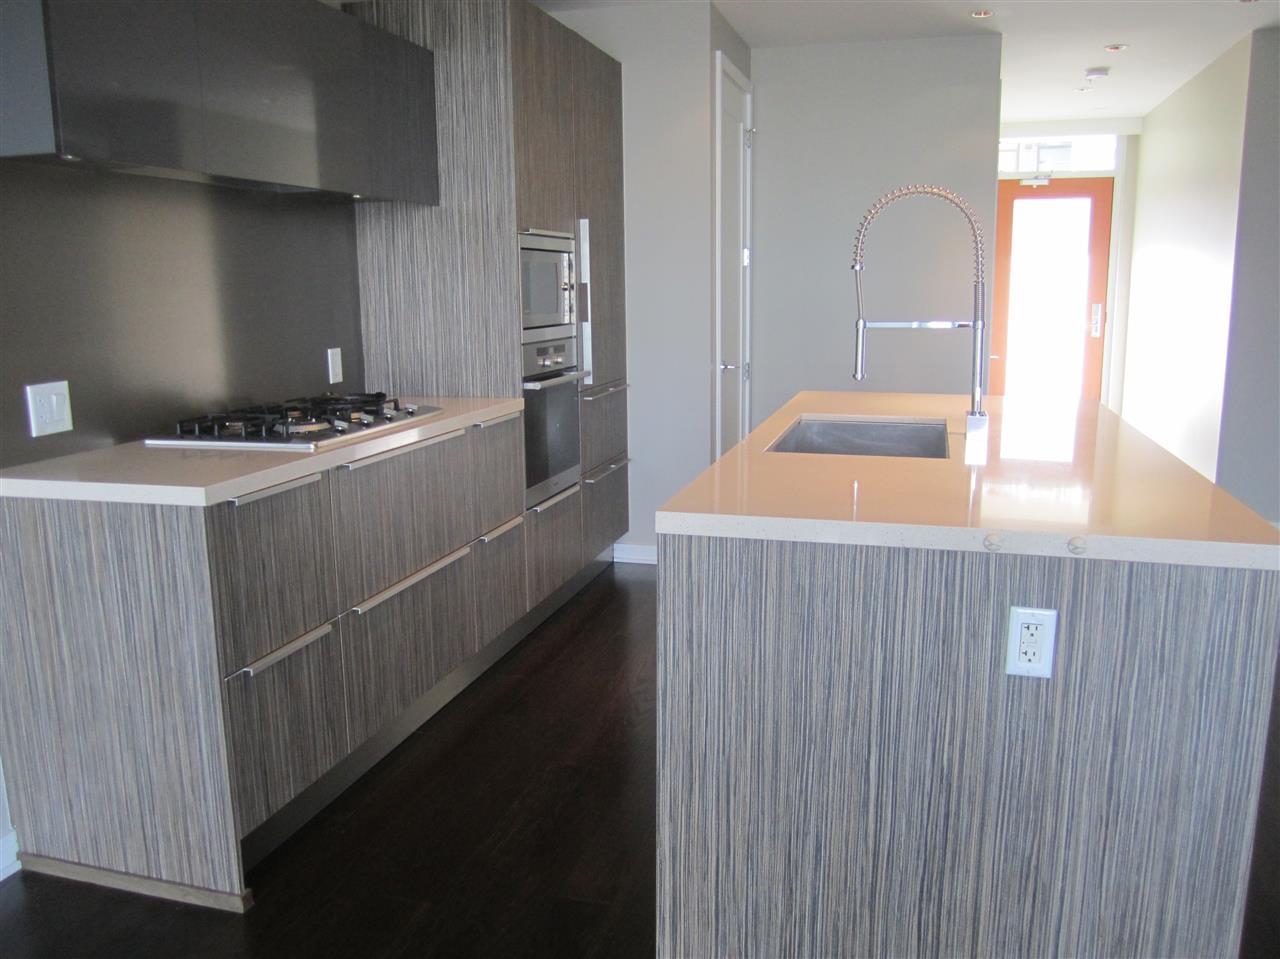 Condo Apartment at 405 12 ATHLETES WAY, Unit 405, Vancouver West, British Columbia. Image 3